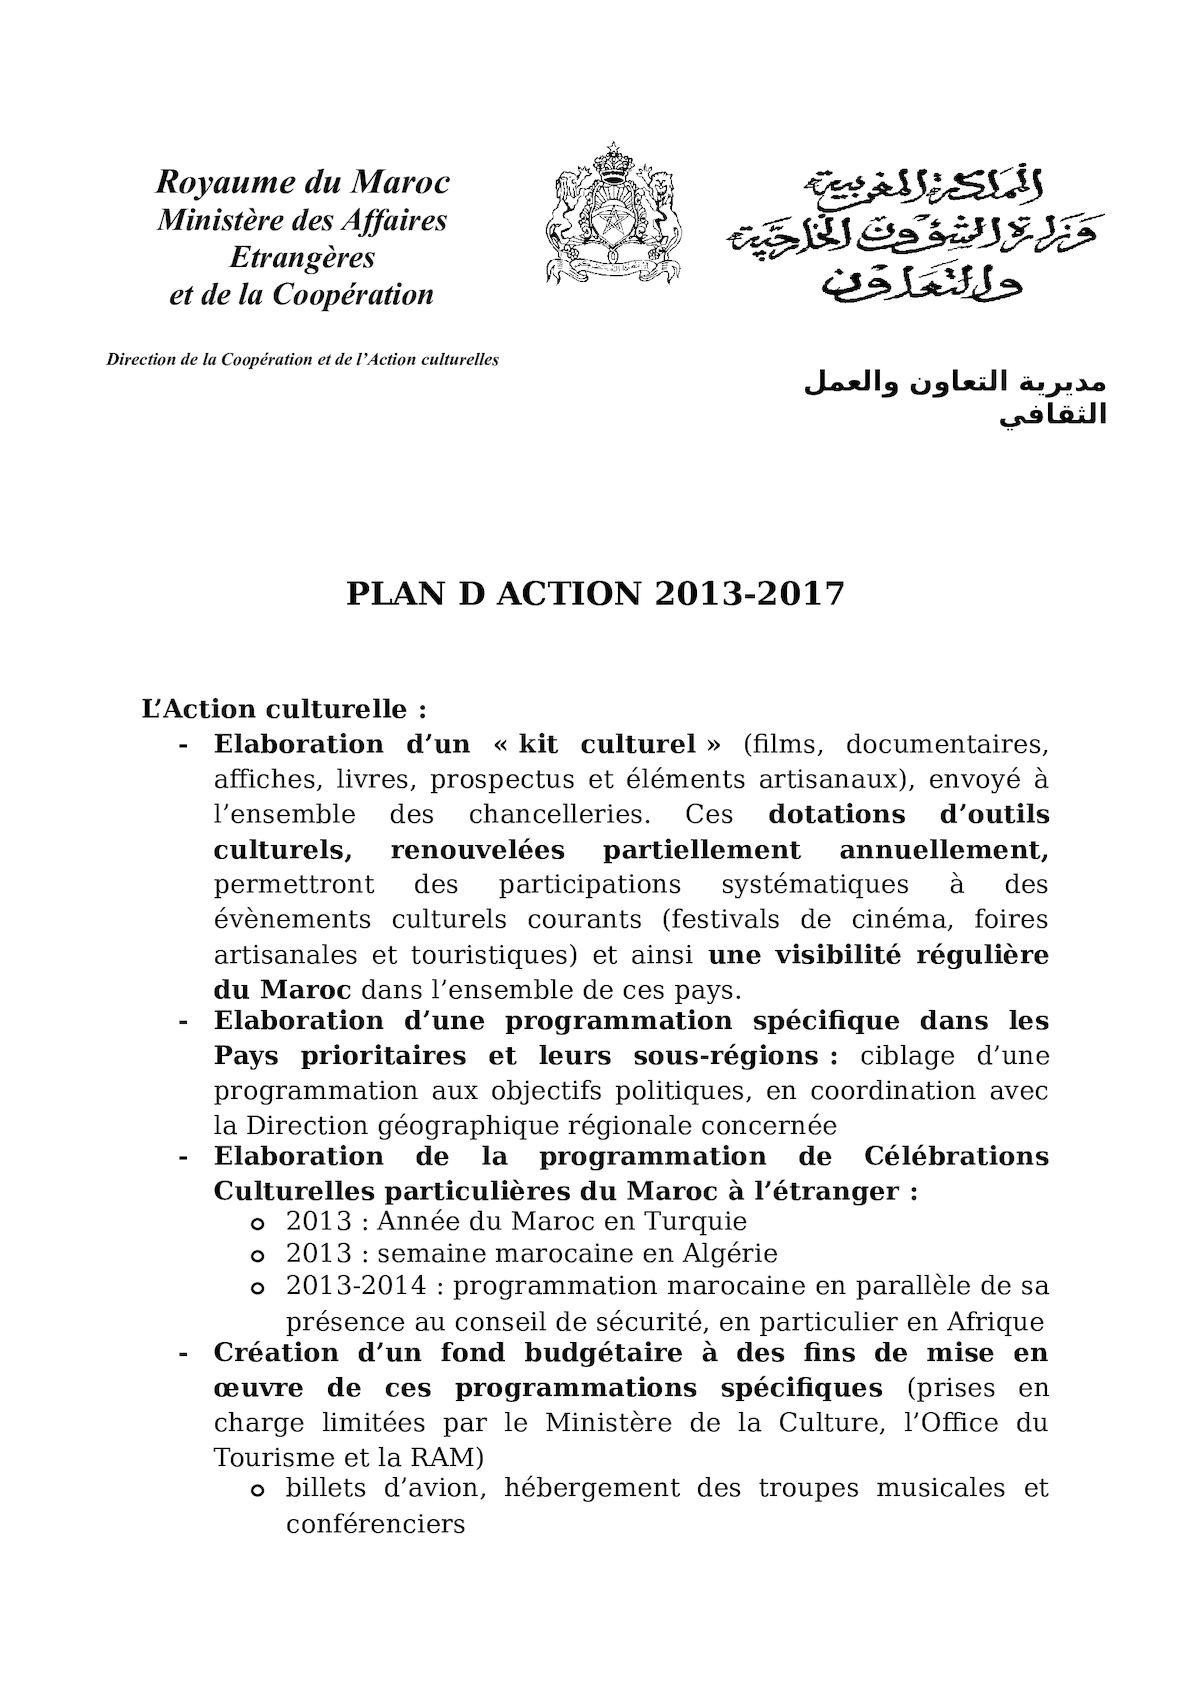 Plan D'action 2013 2017